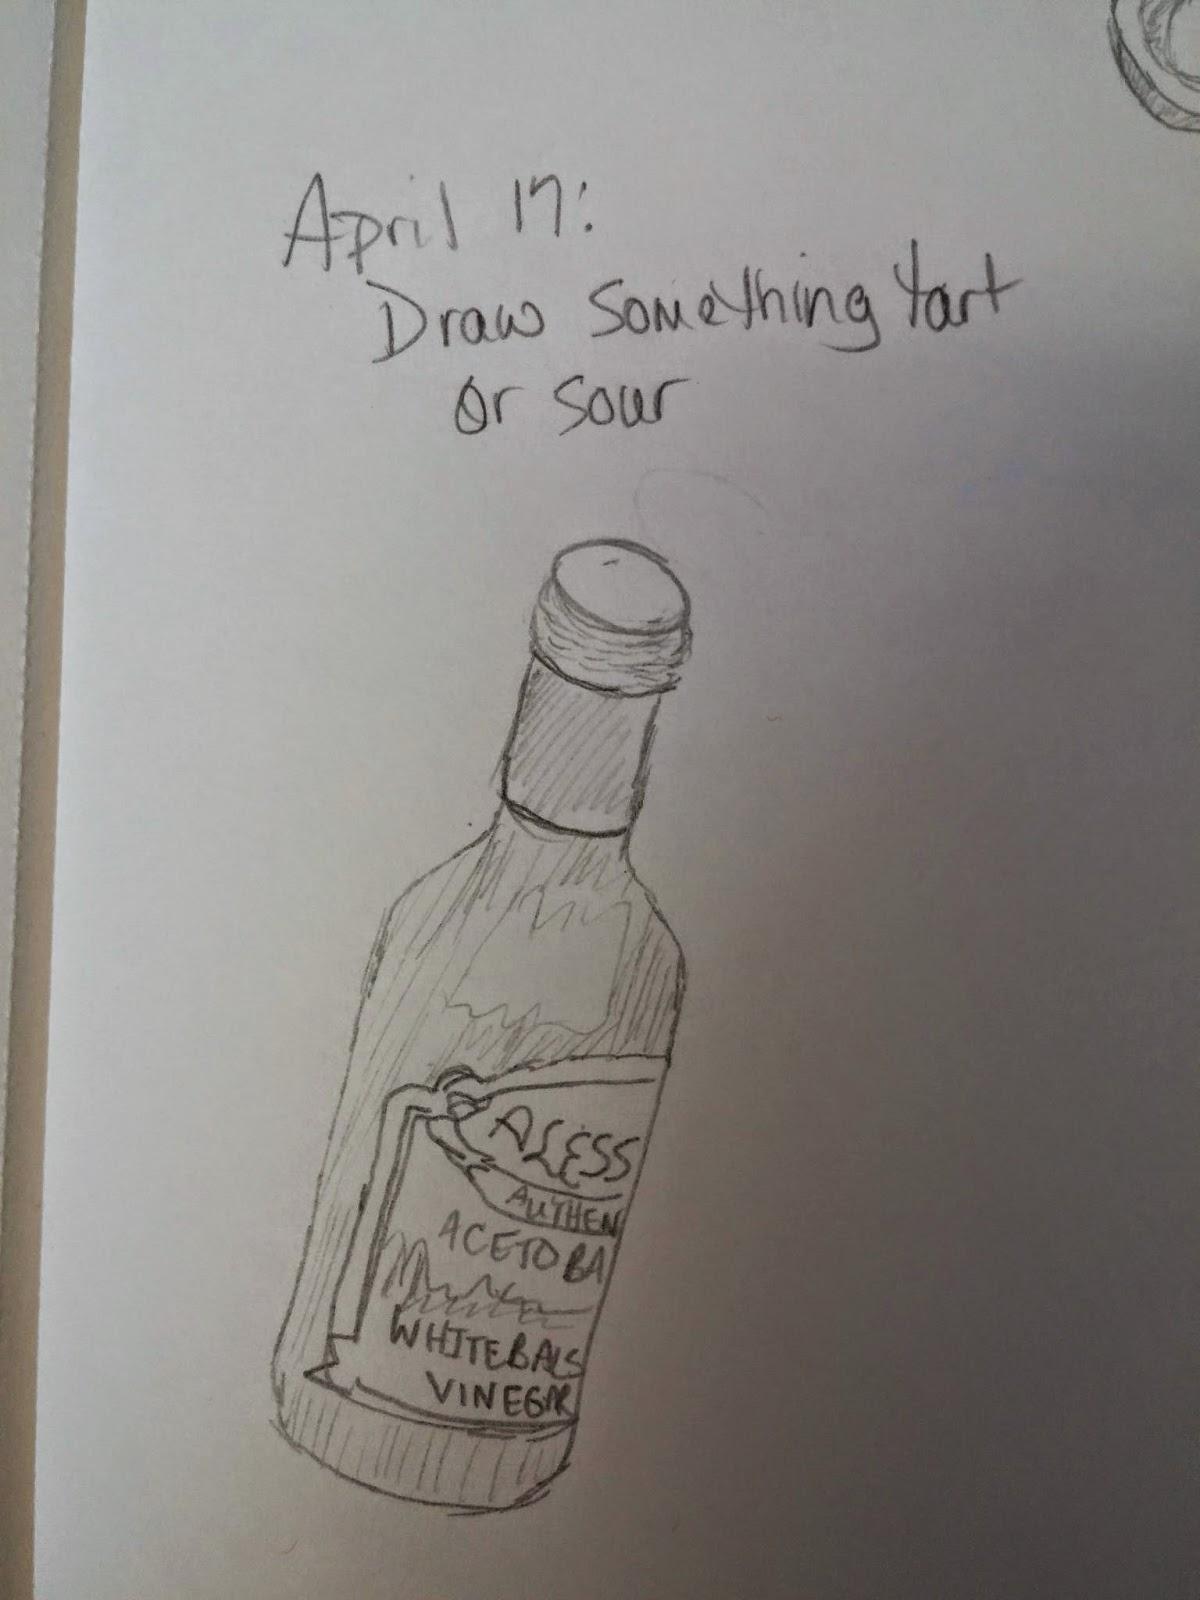 My Sketching Challenge 2015 April 17 Draw Something Tart Or Sour